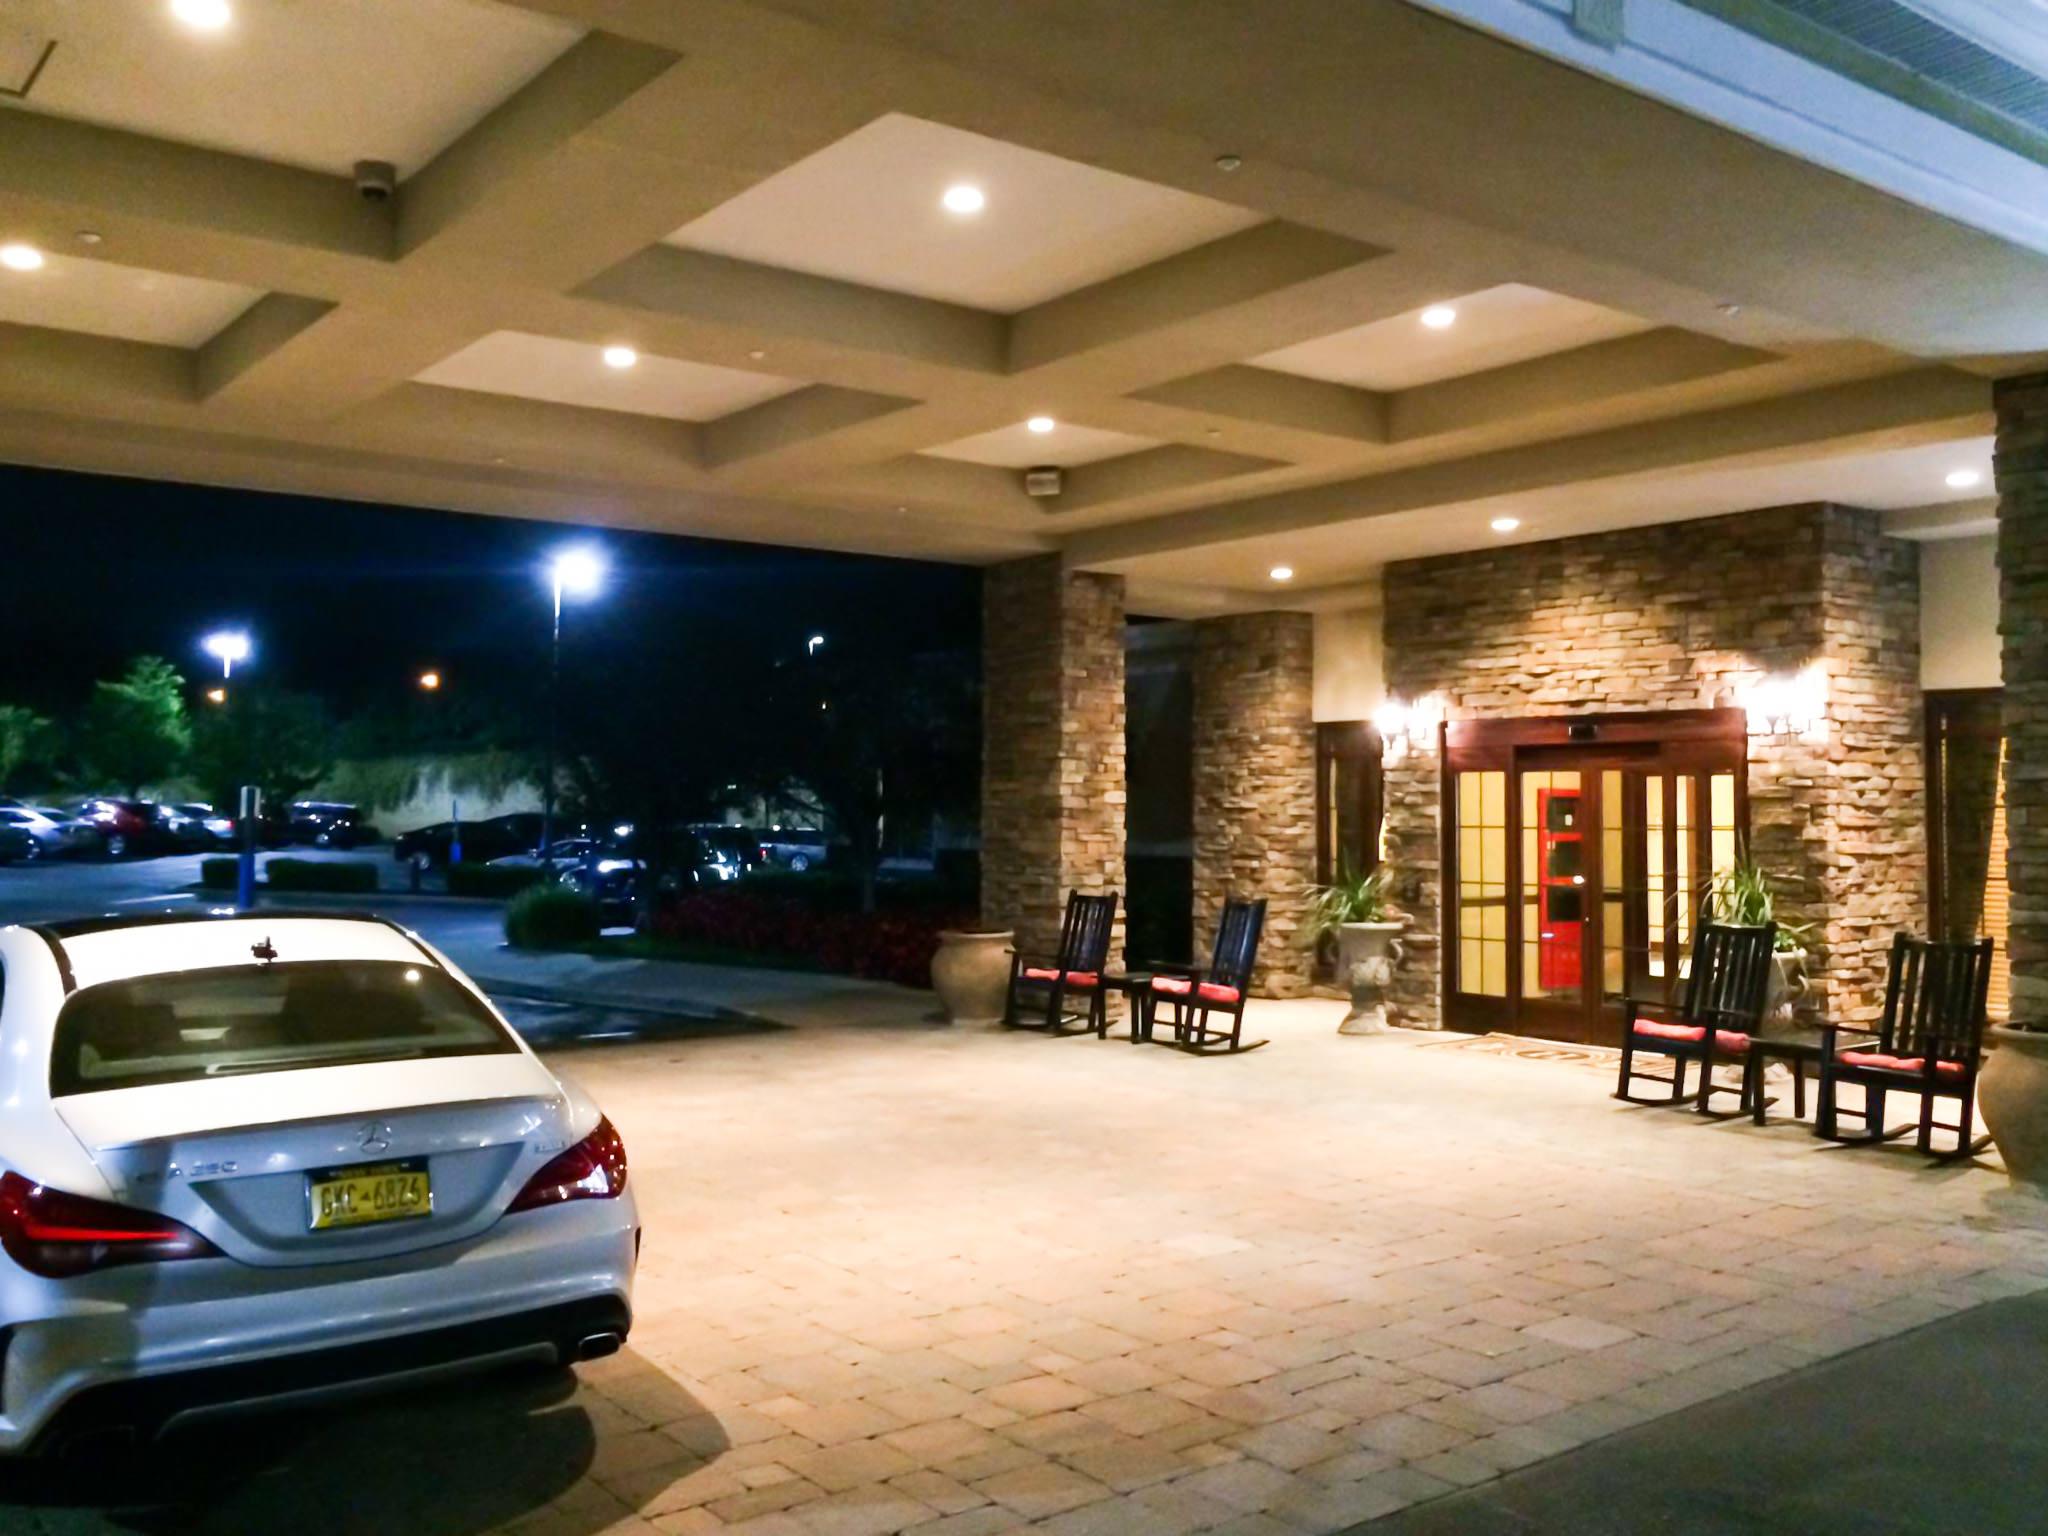 Hilton Homewood Suites ComPower LED 3-5.jpg